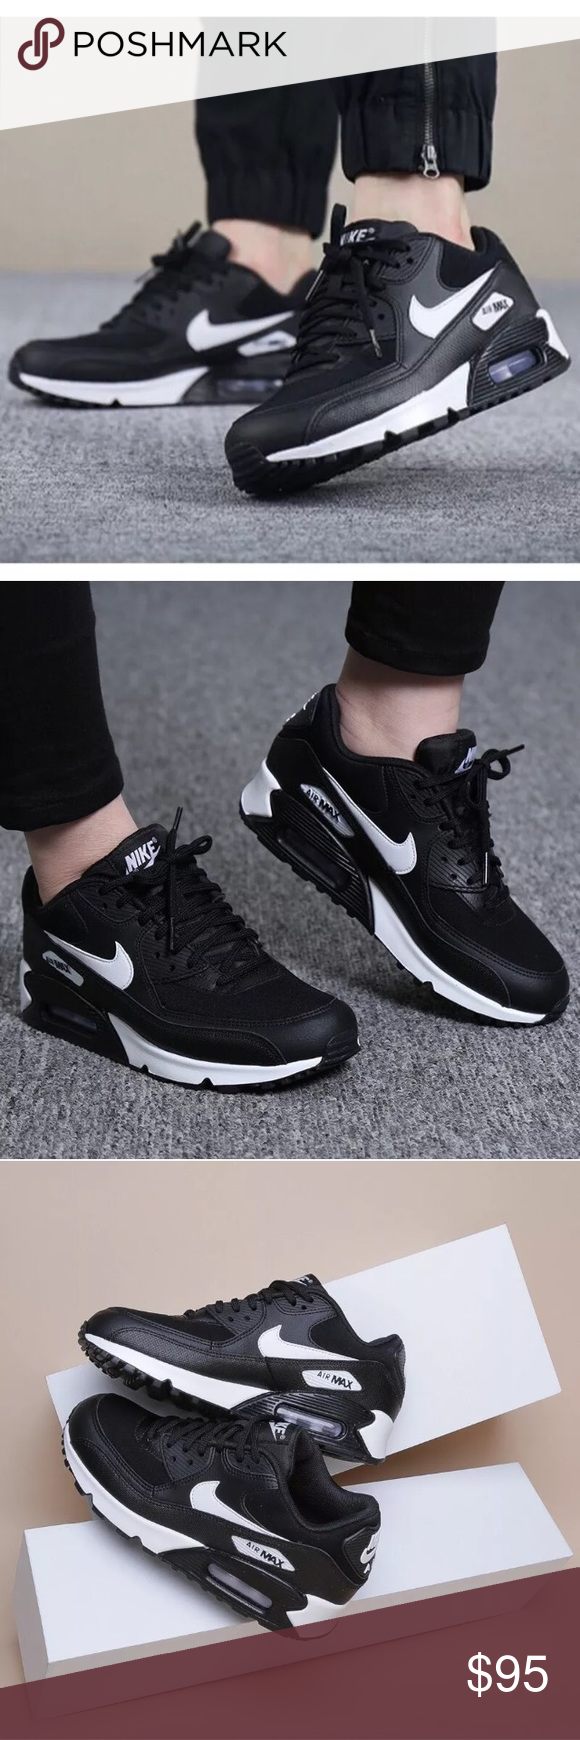 White Sneakers | Nike air max 90 black